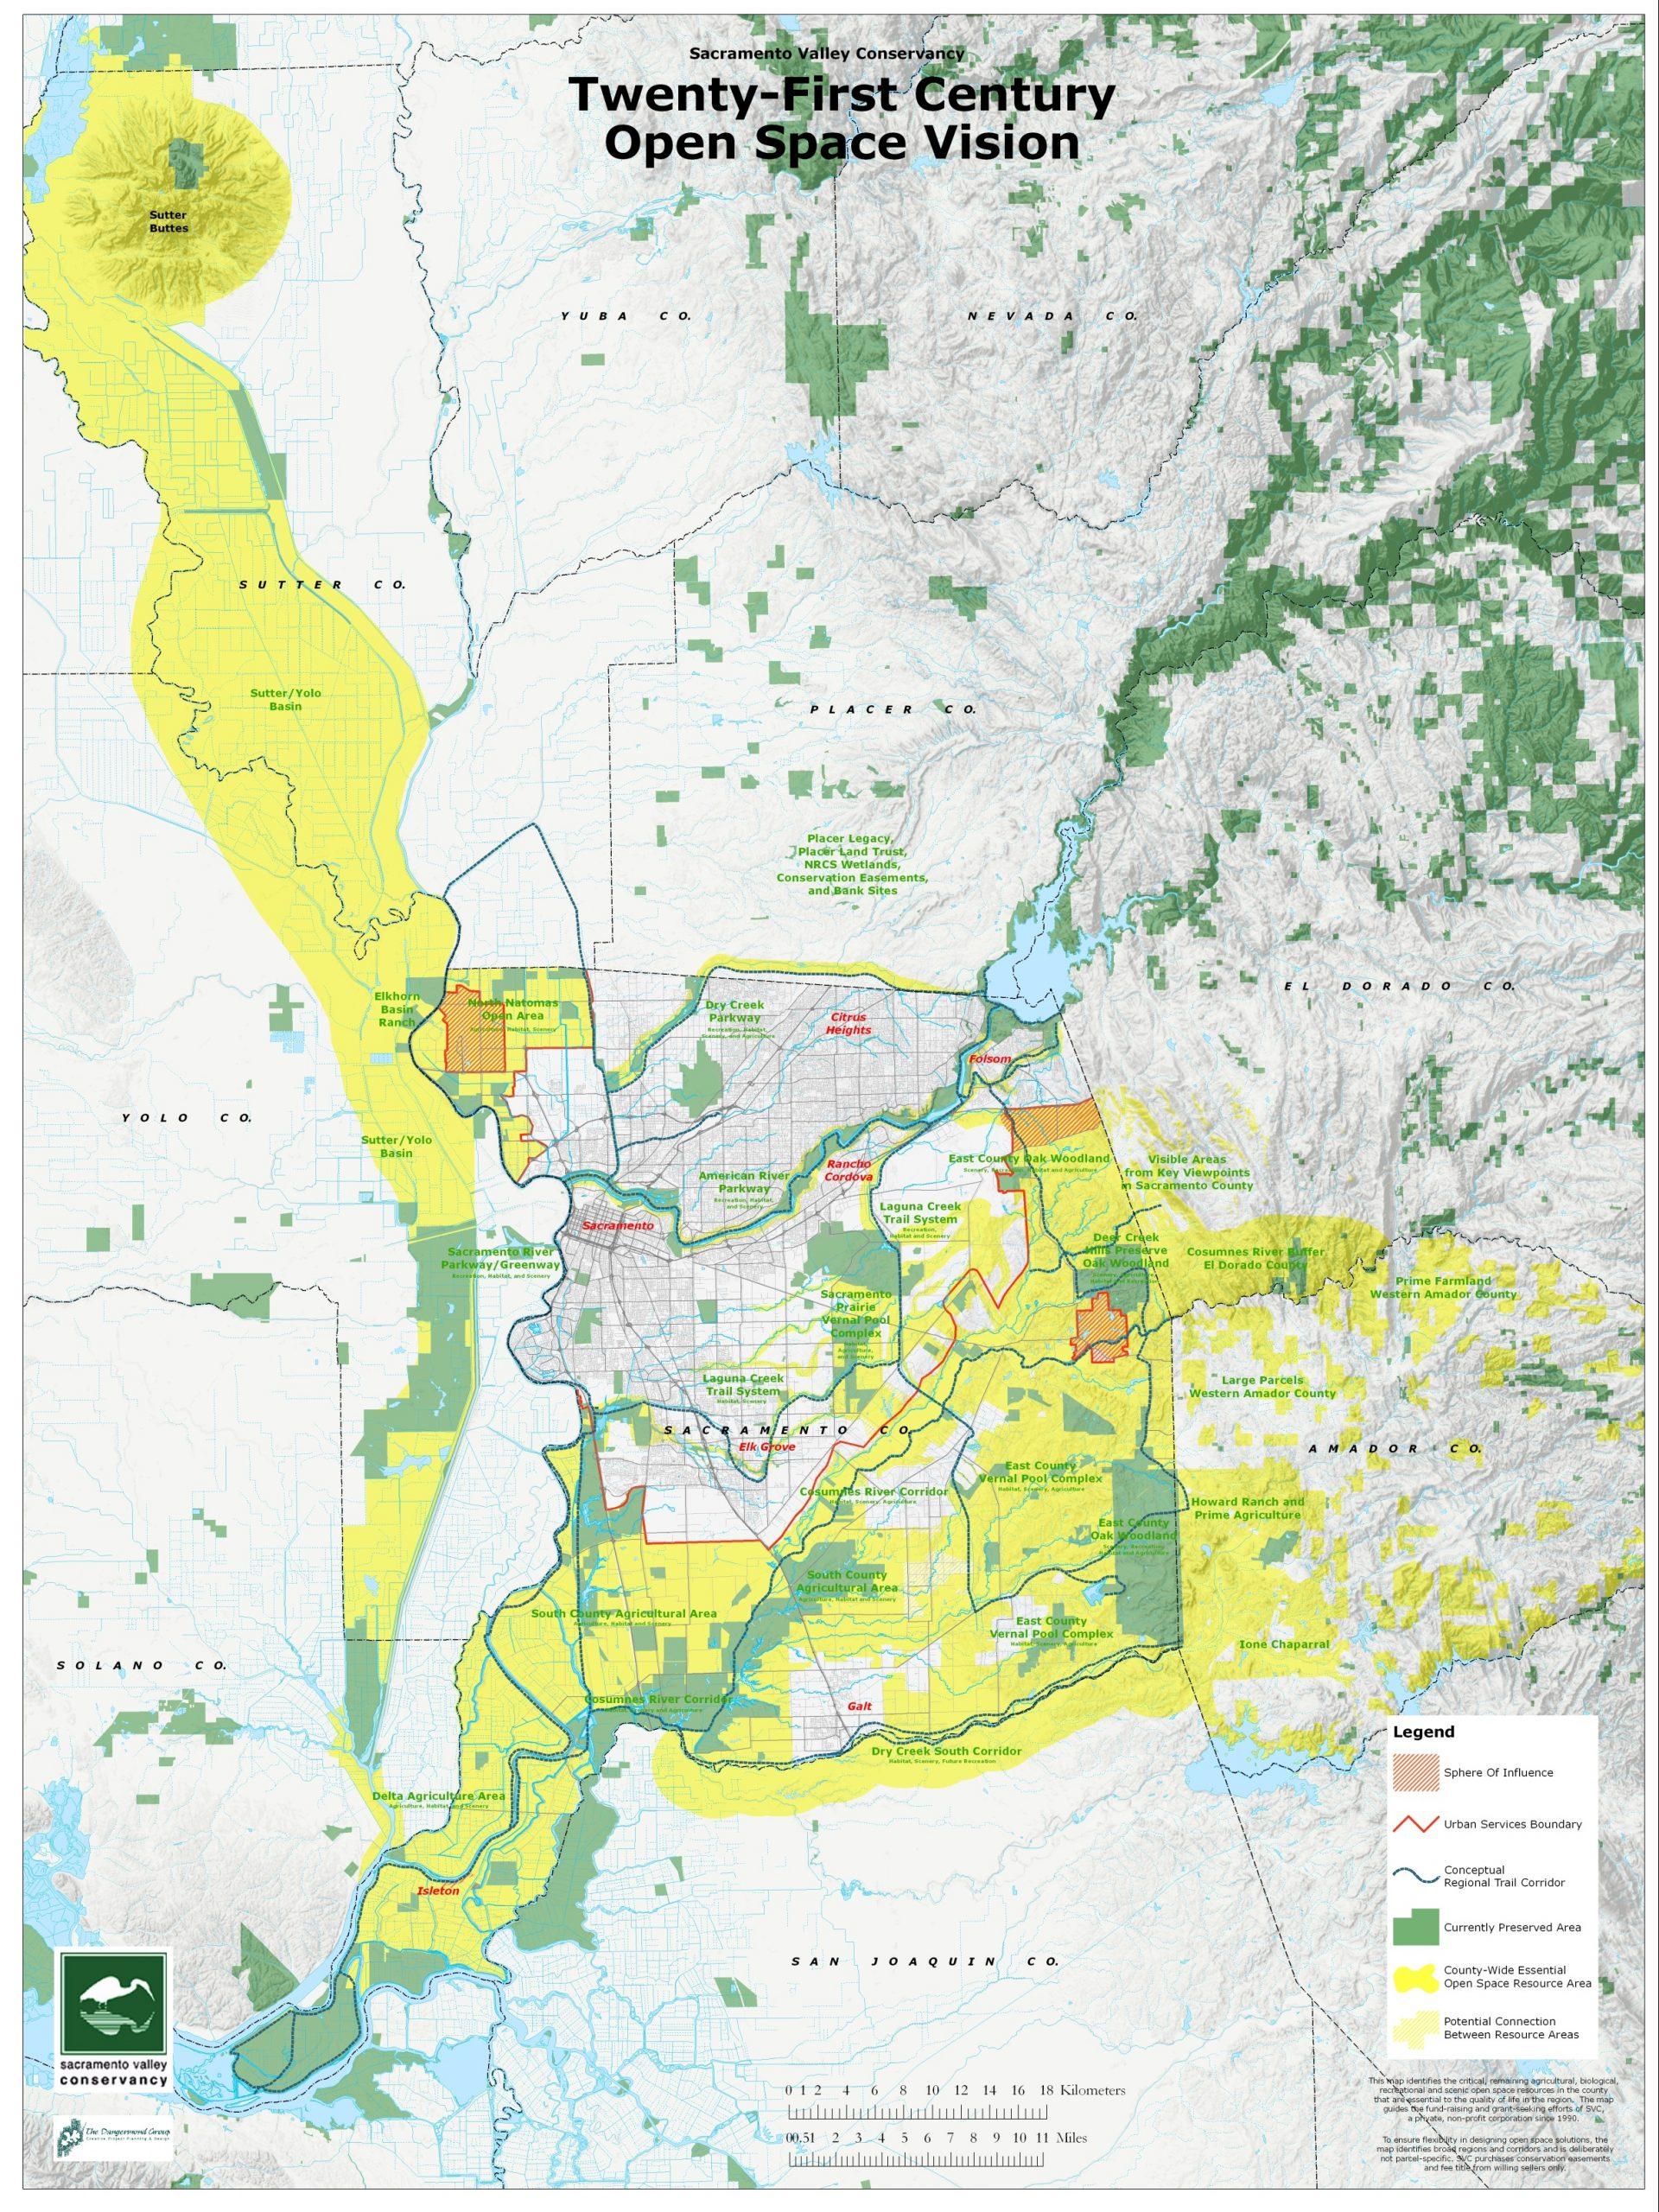 regional map of sacramento valley